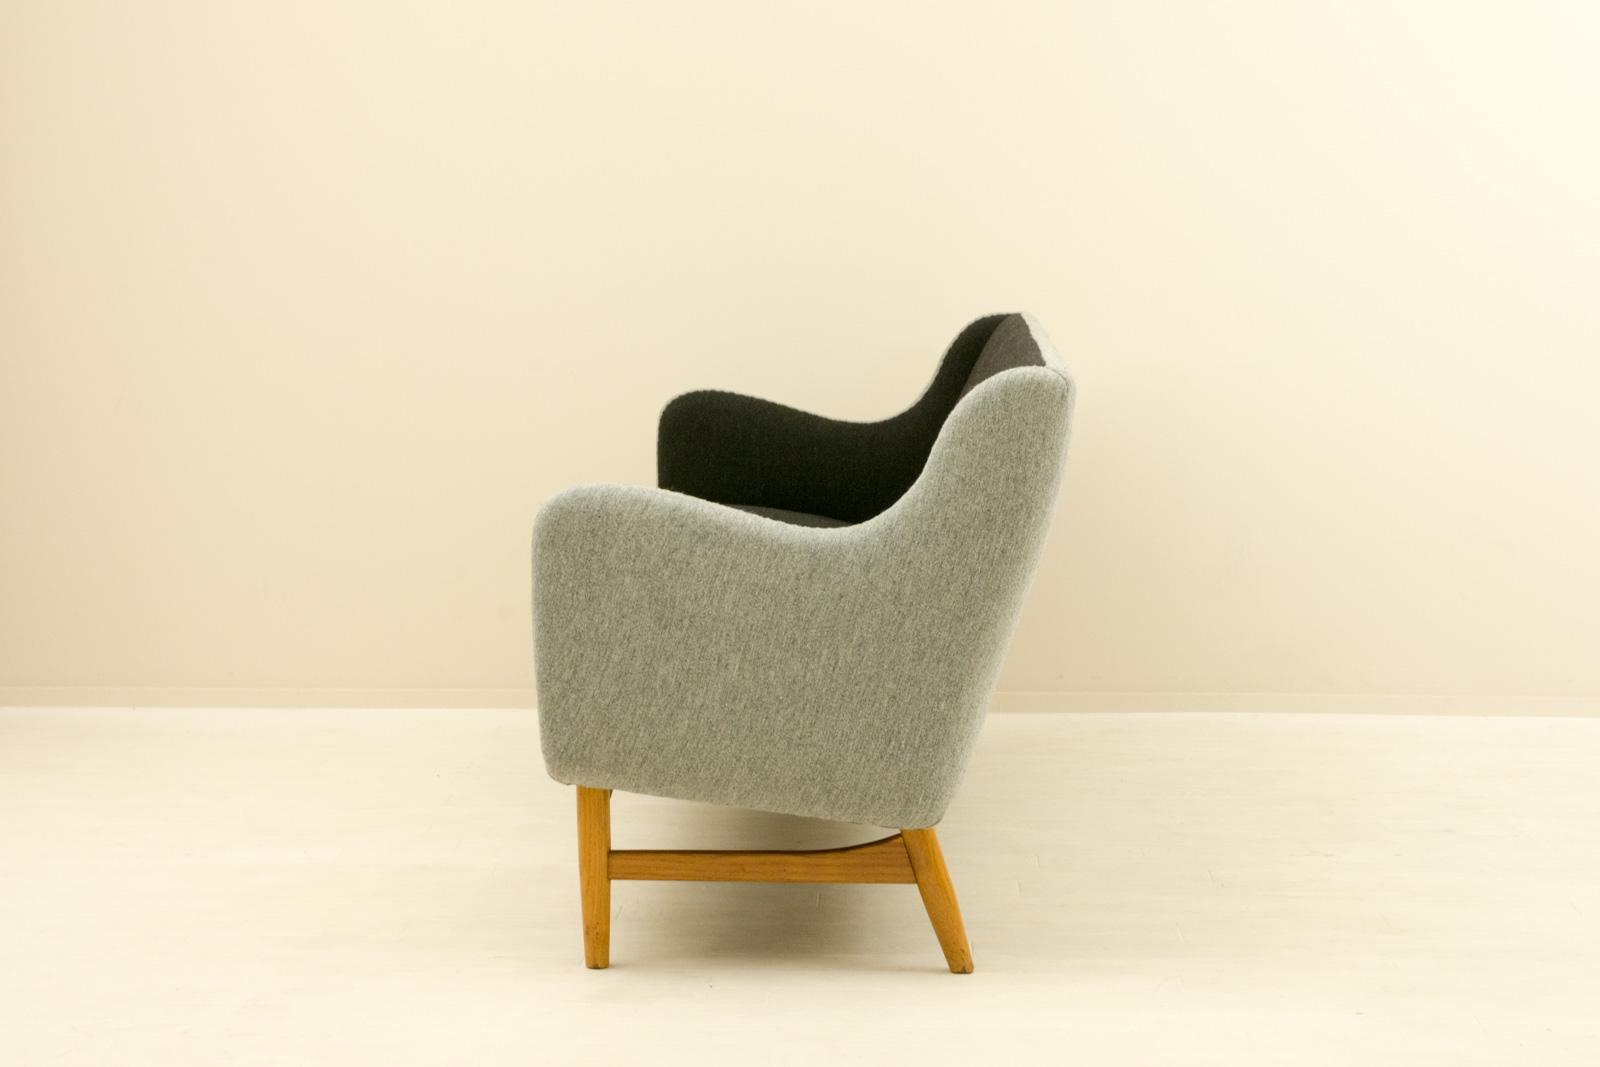 3personers sofa by Finn Juhl for Soren Willadsen